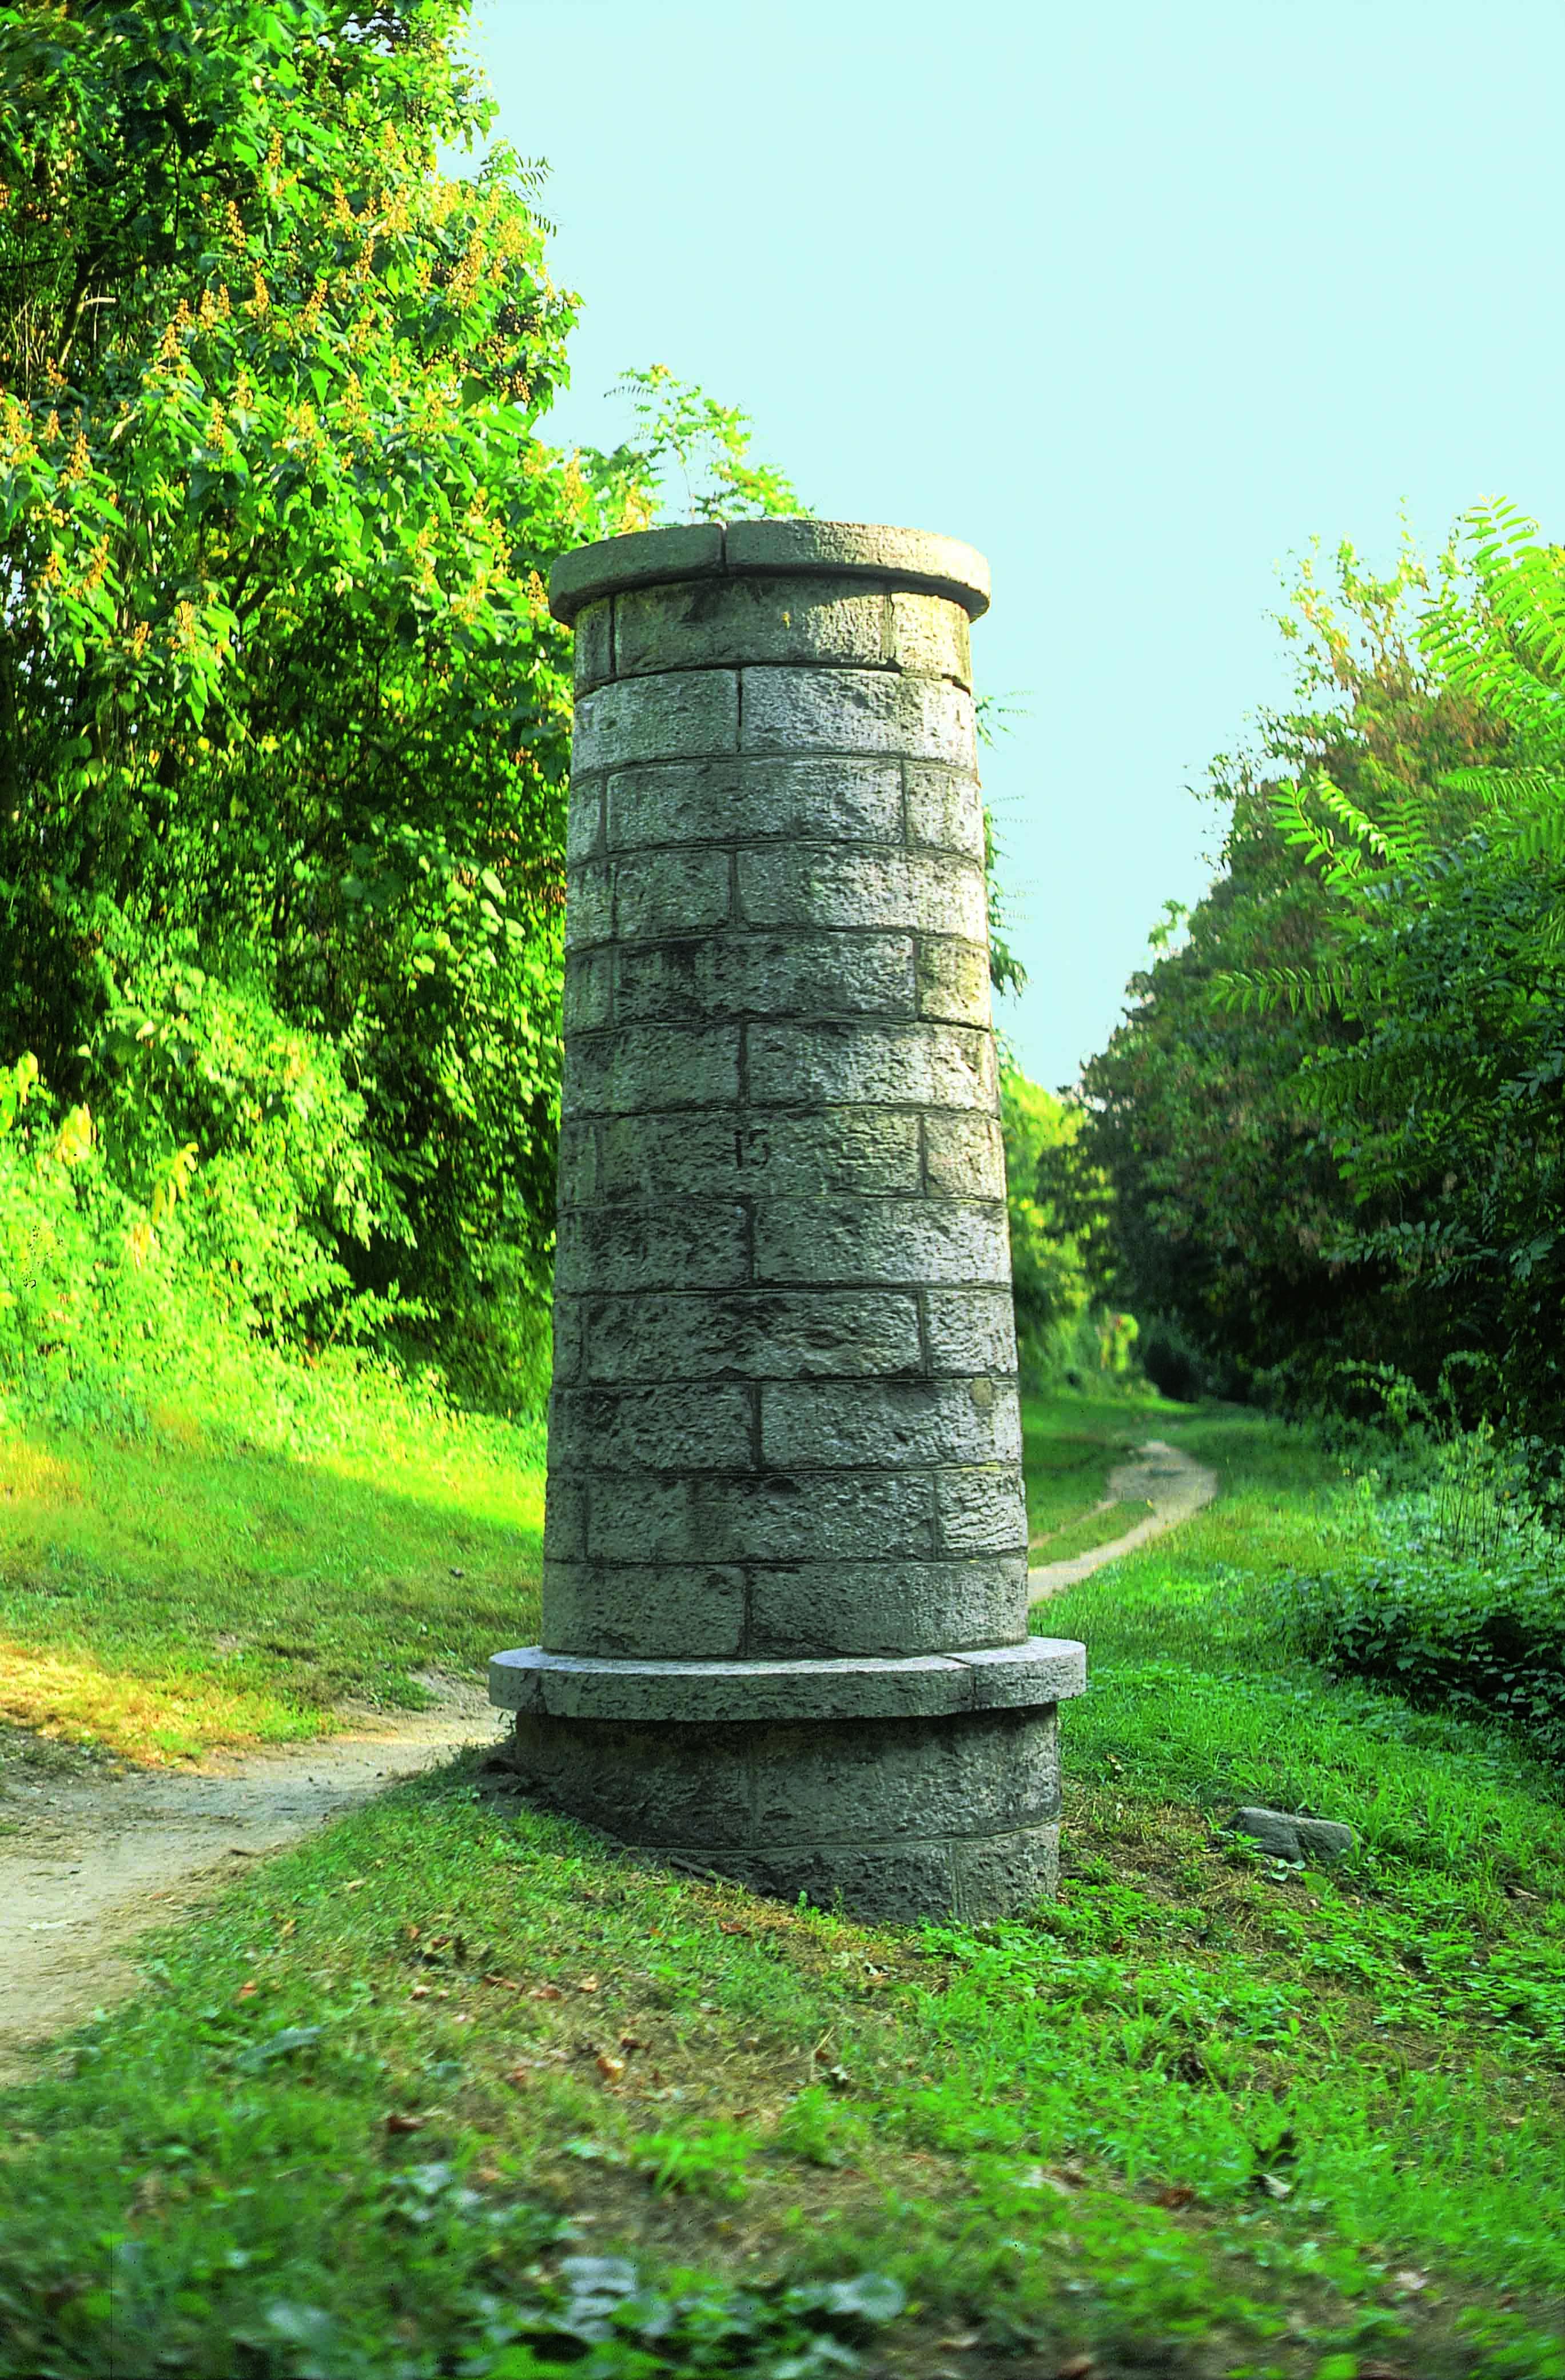 Ventilator on the Old Croton Aqueduct.